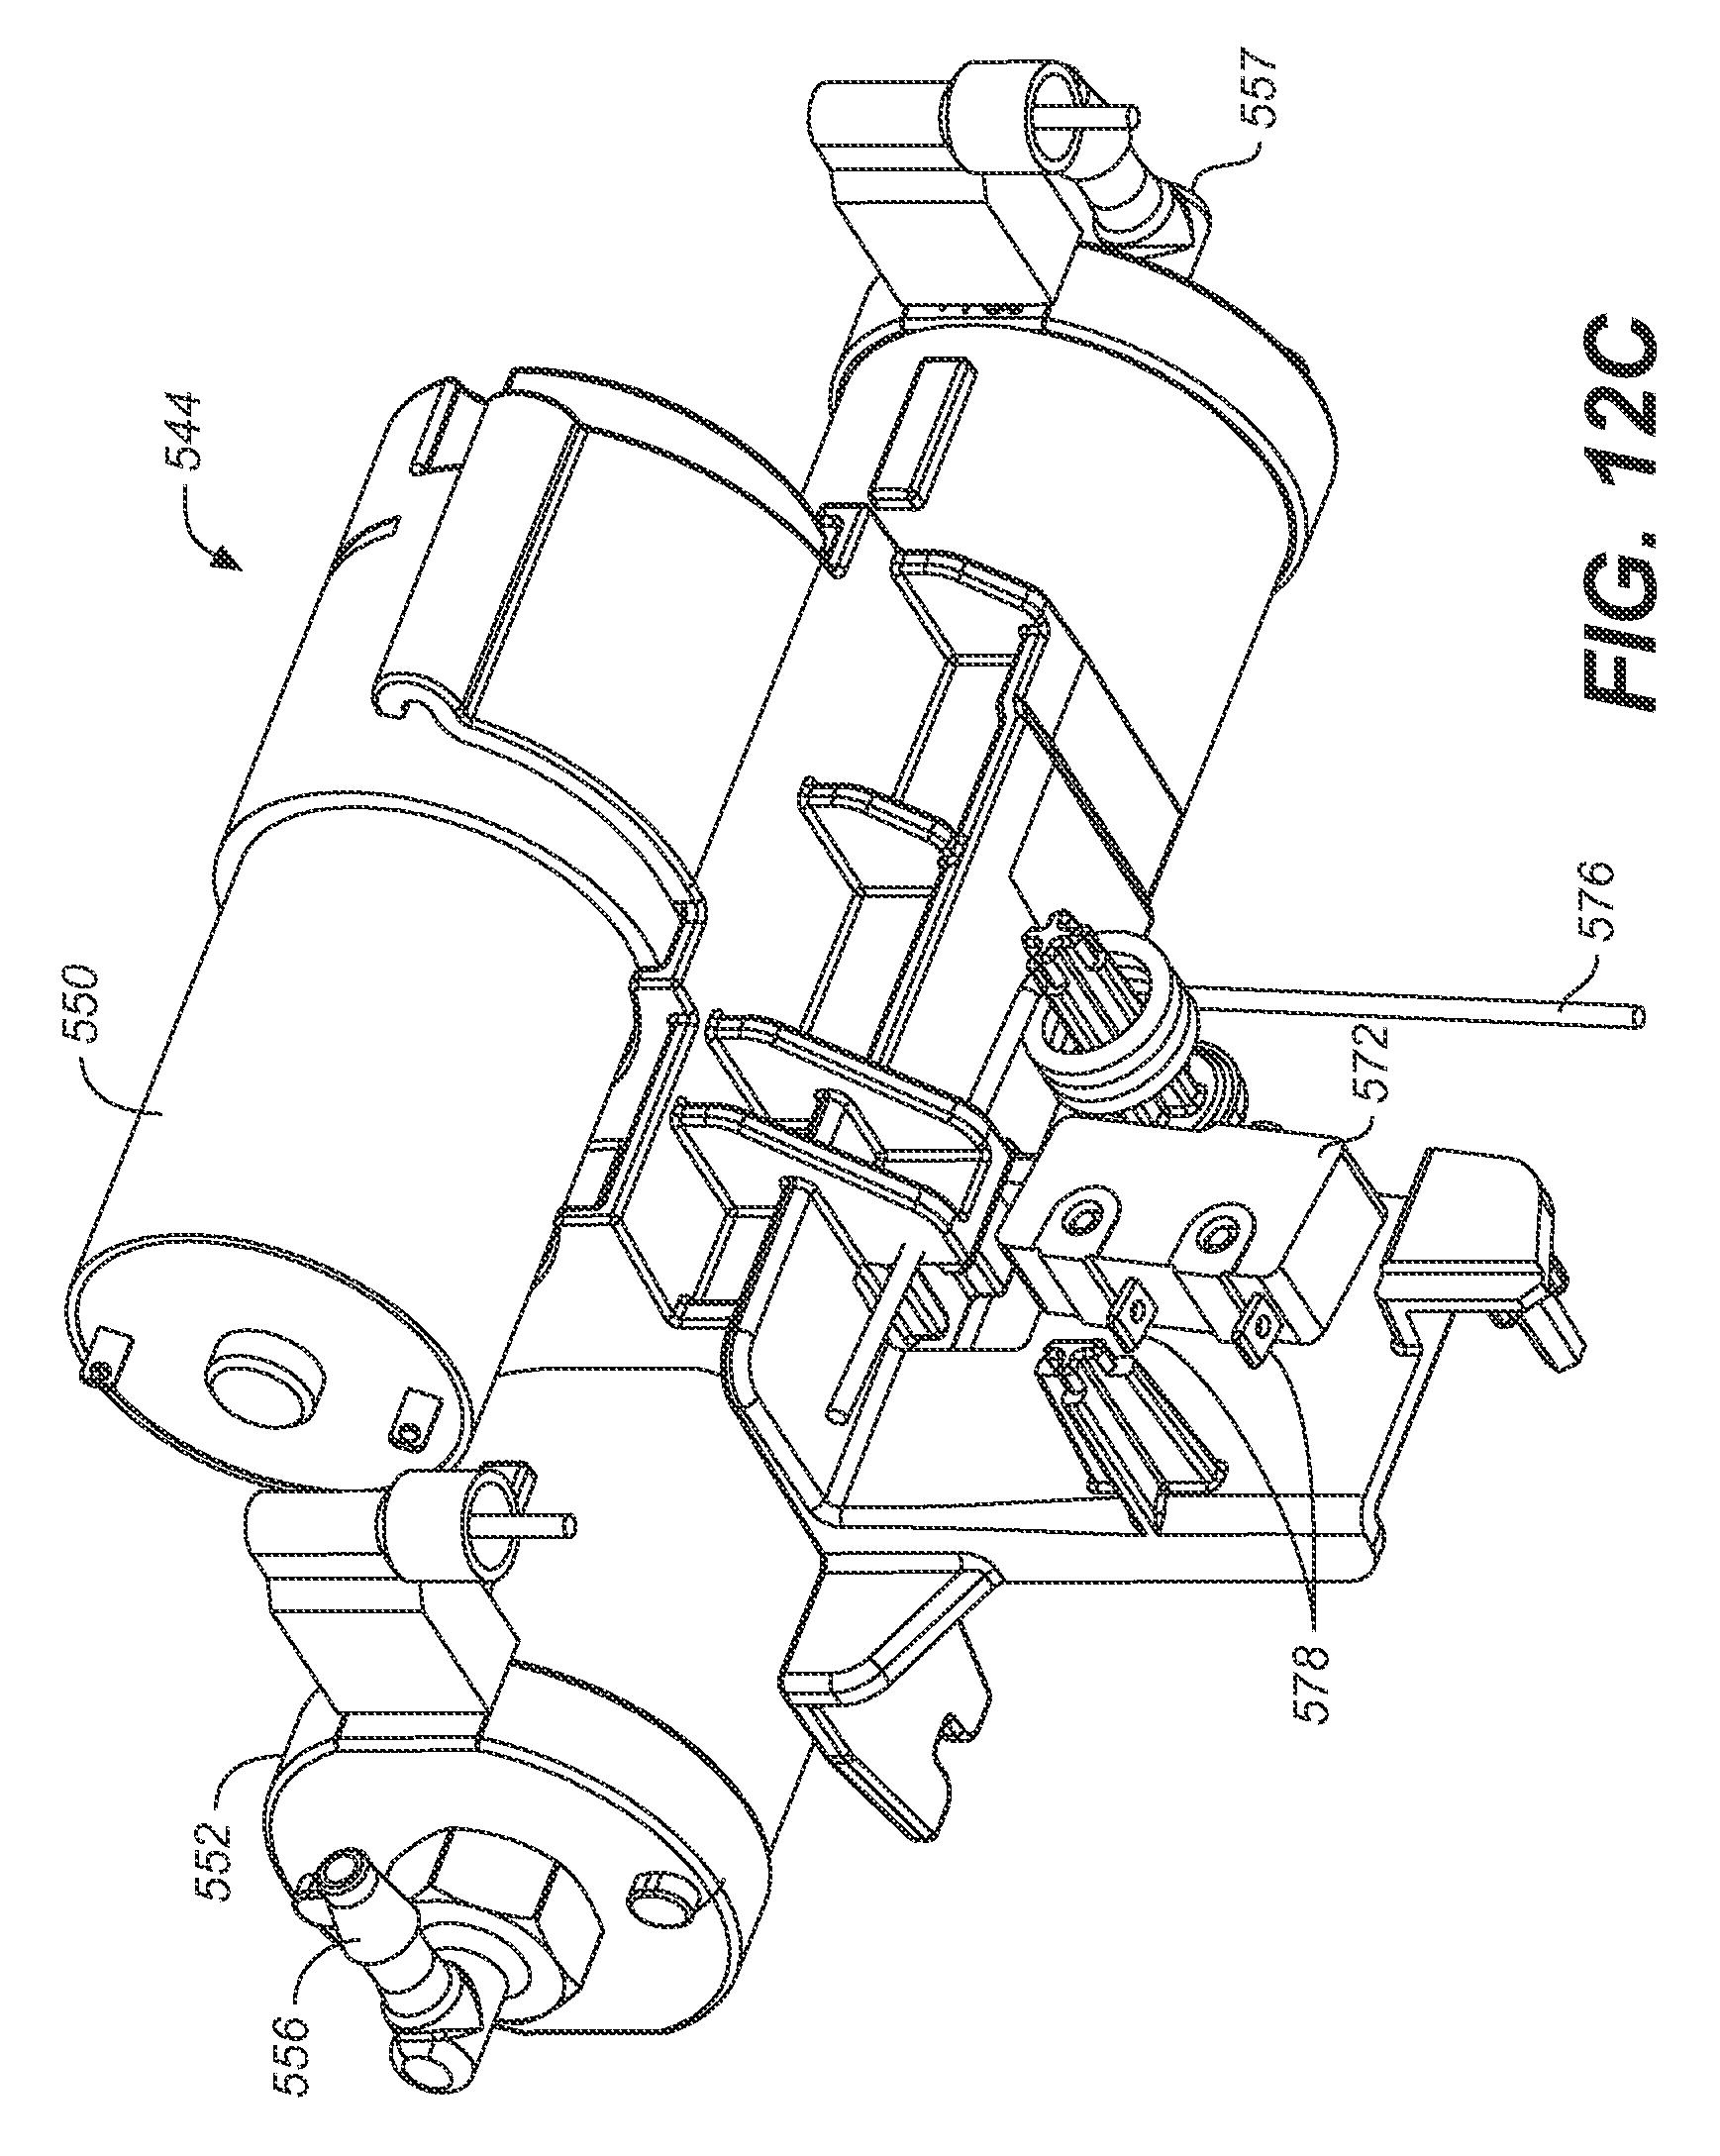 Cool 1994 honda fourtrax 300 wiring diagram images wiring diagram